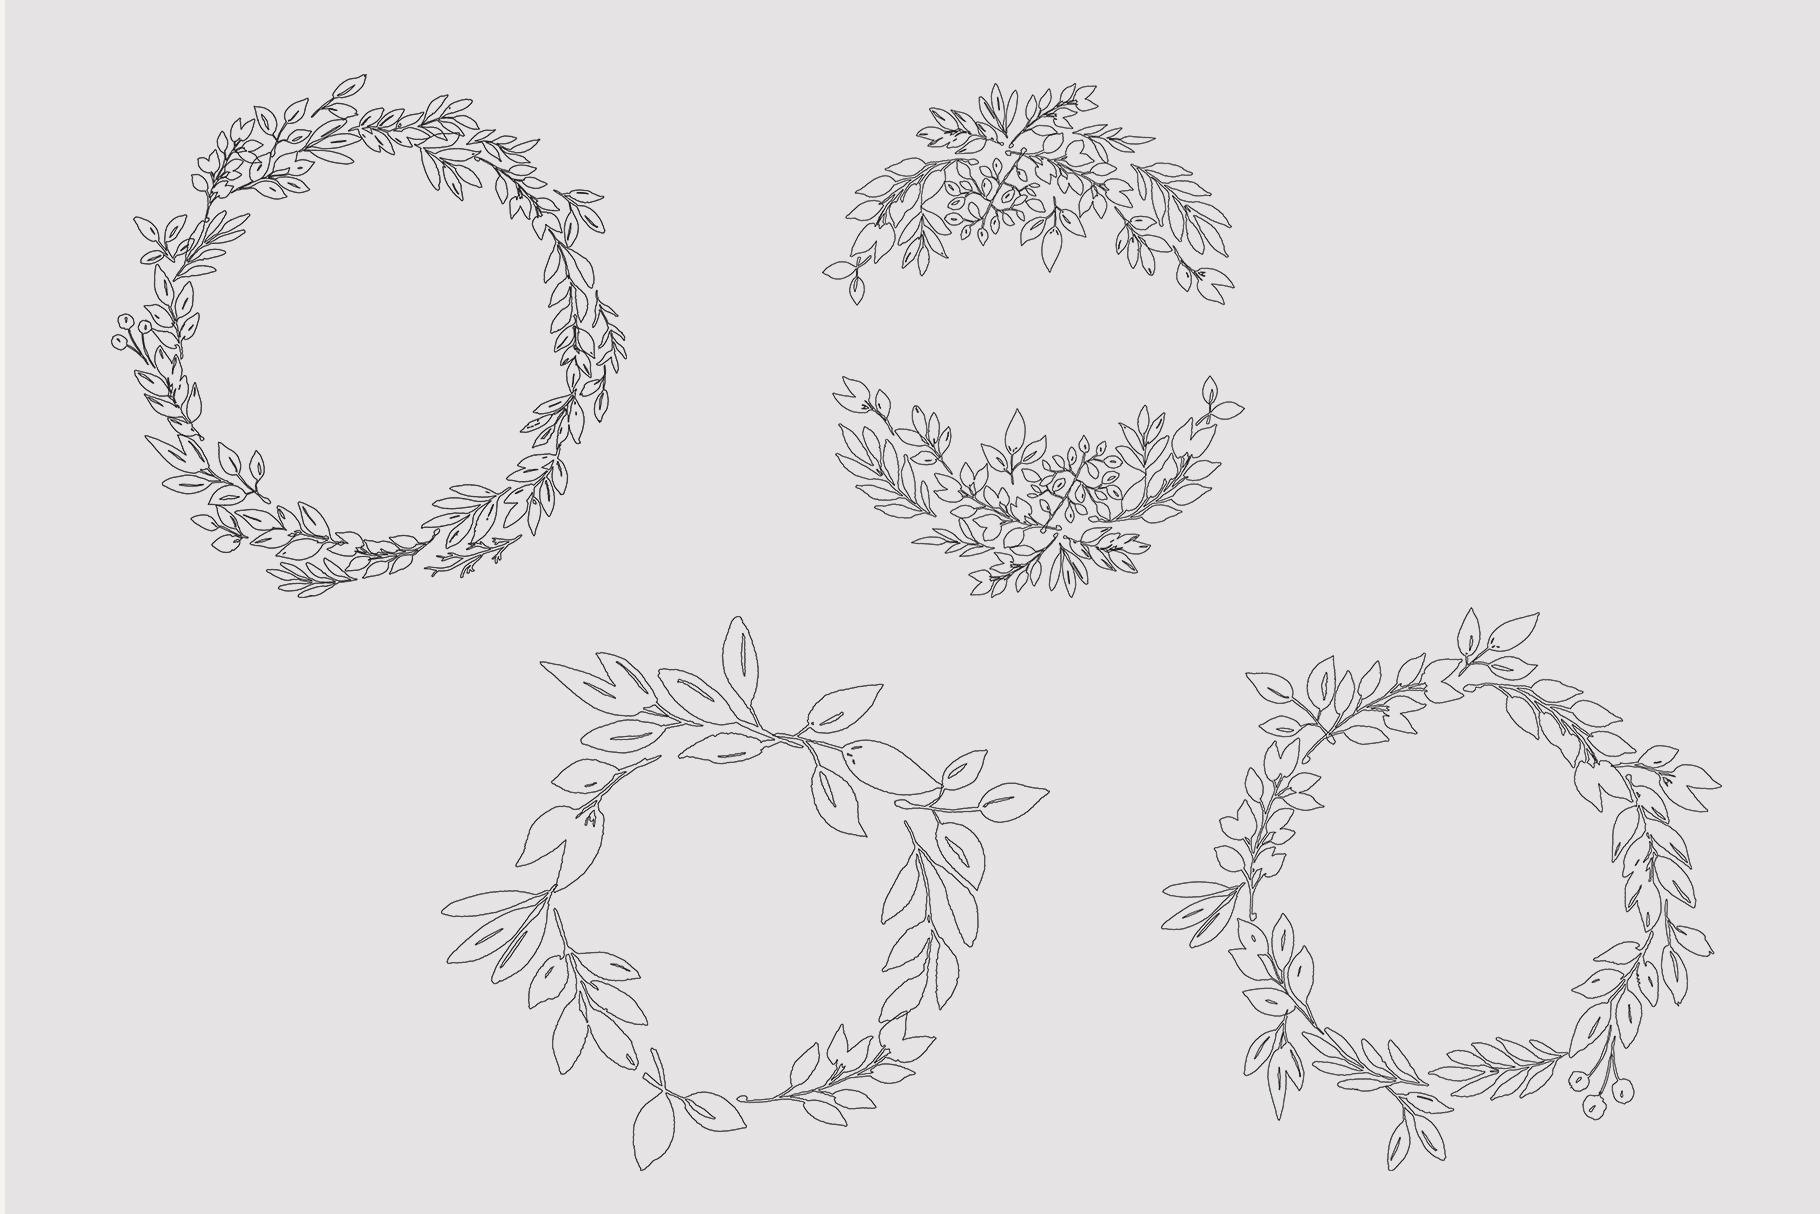 Foliage doodles clip art set, hand drawn foliage, hand drawn example image 5